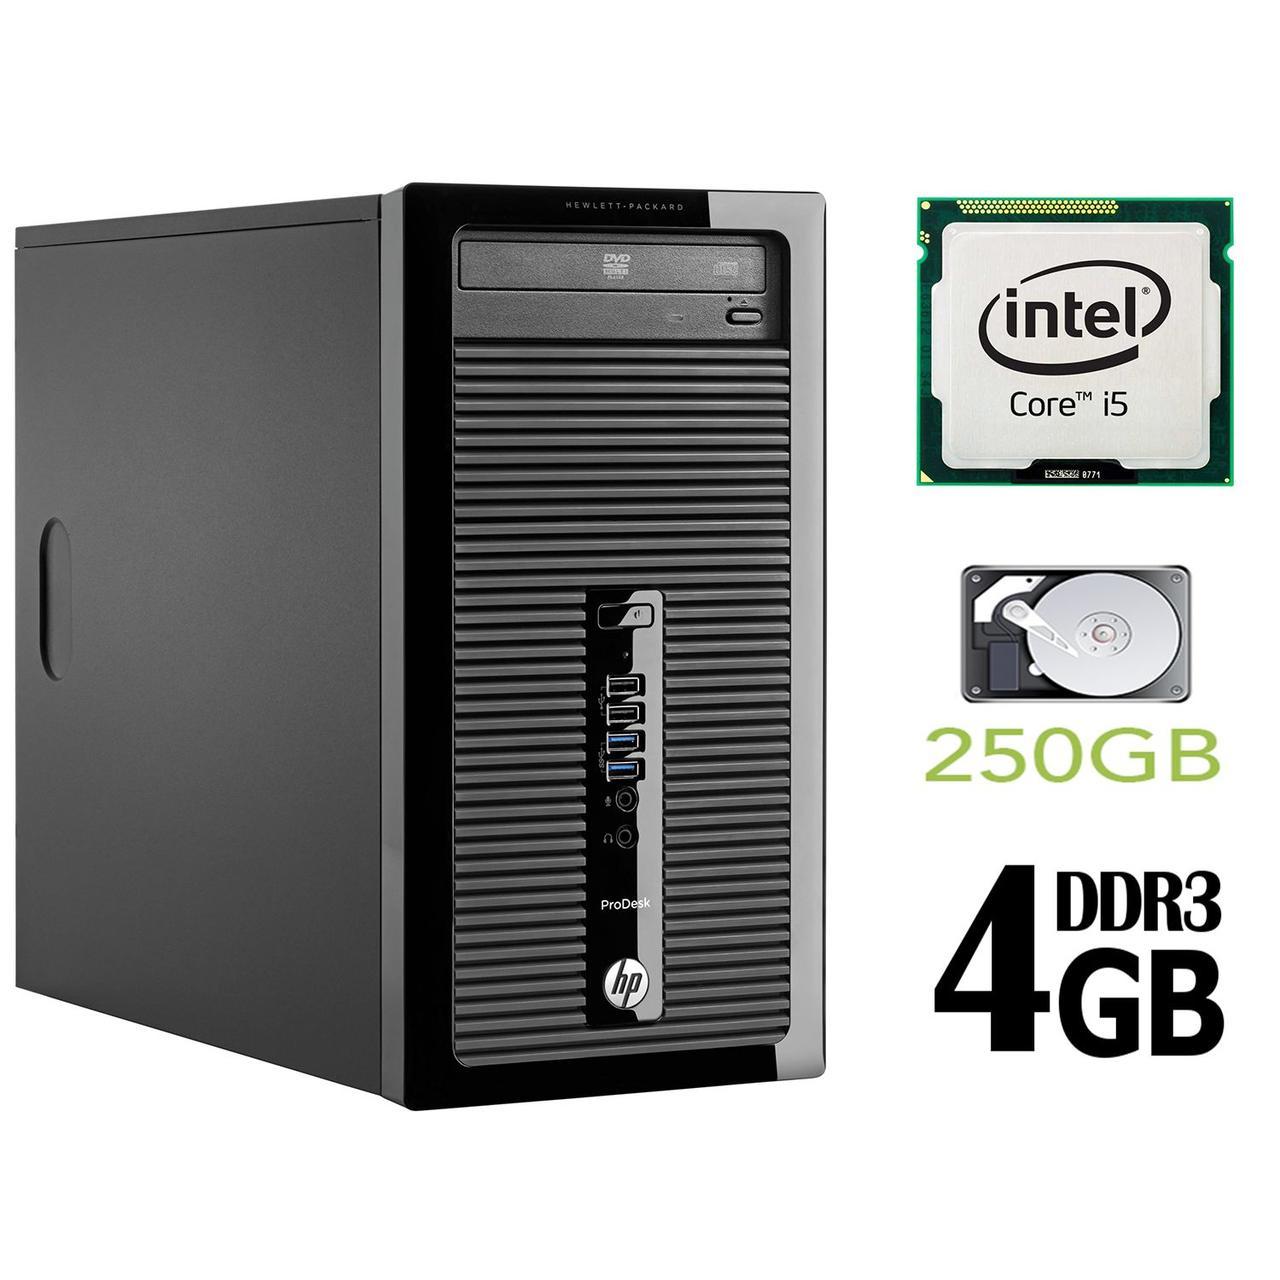 HP 400 G1 MT / Intel Core i5-4570 (4 ядра по 3.2GHz) / 4GB DDR3 / 250GB HDD